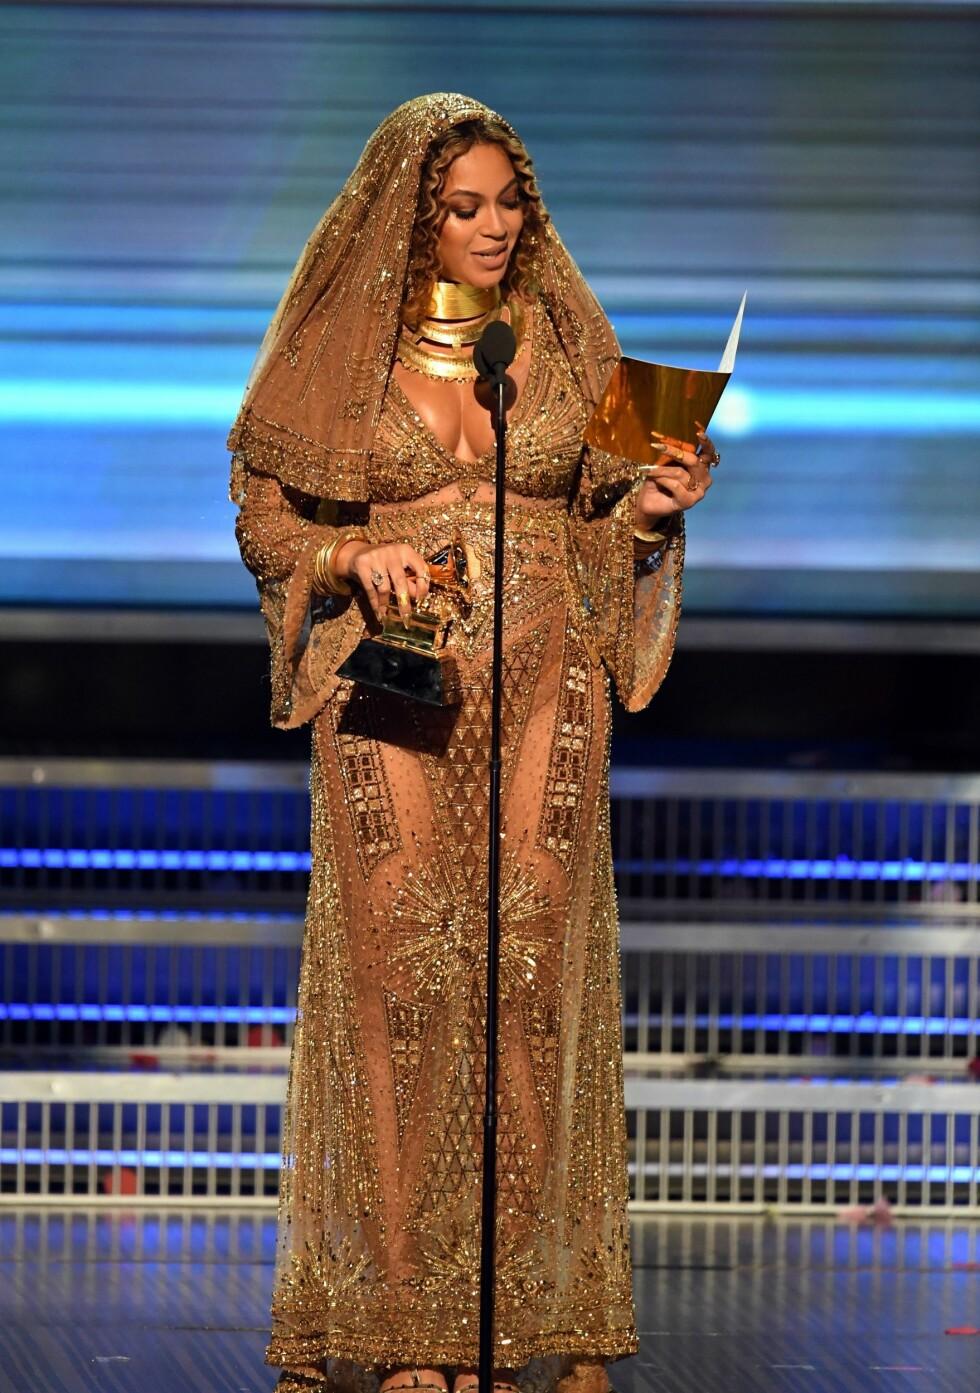 GRAMMY AWARDS: Beyonce i spesialdesignet Peter Dundas-kjole Foto: AFP